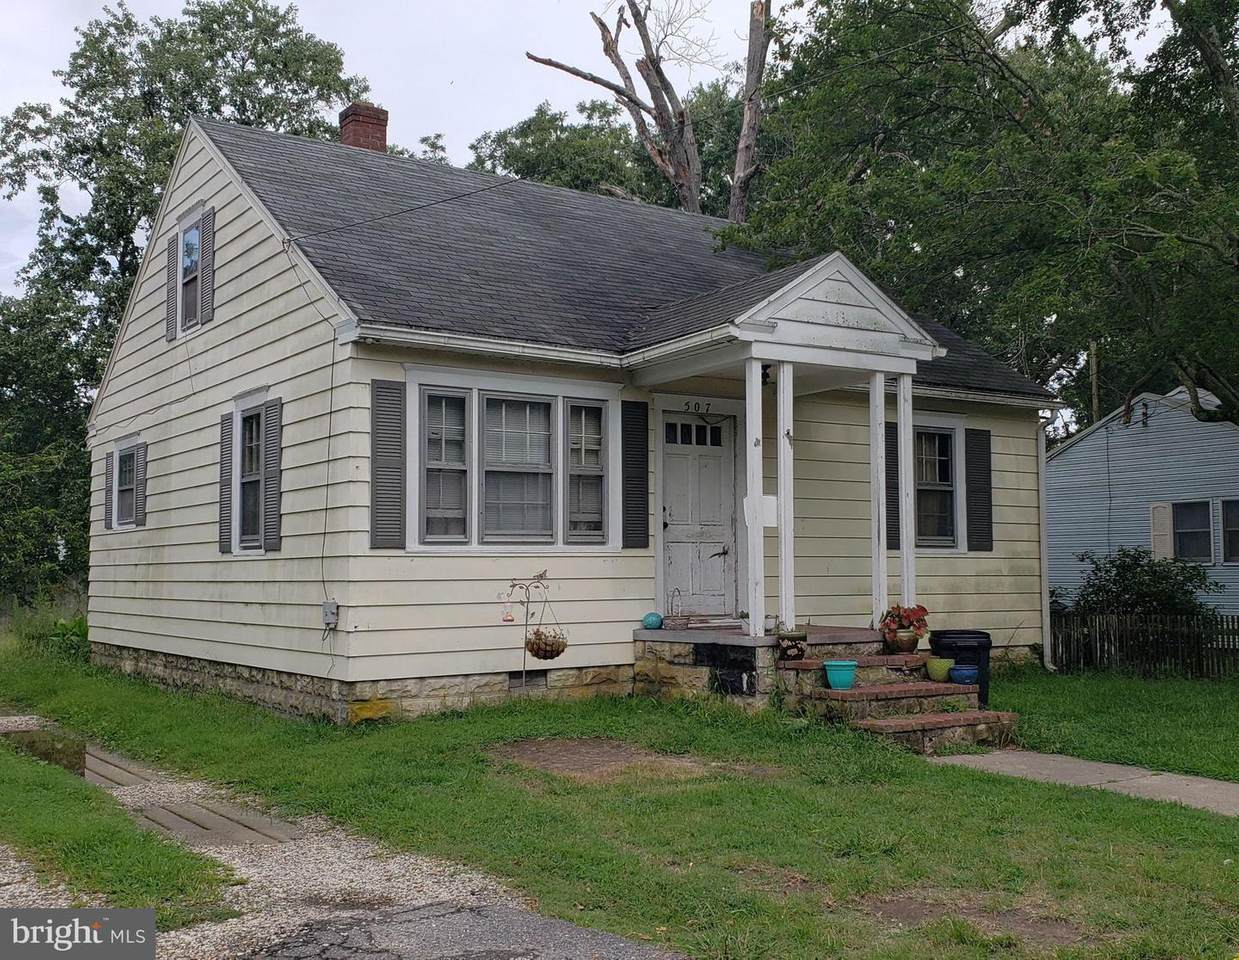 507 Cedar Street - Photo 1